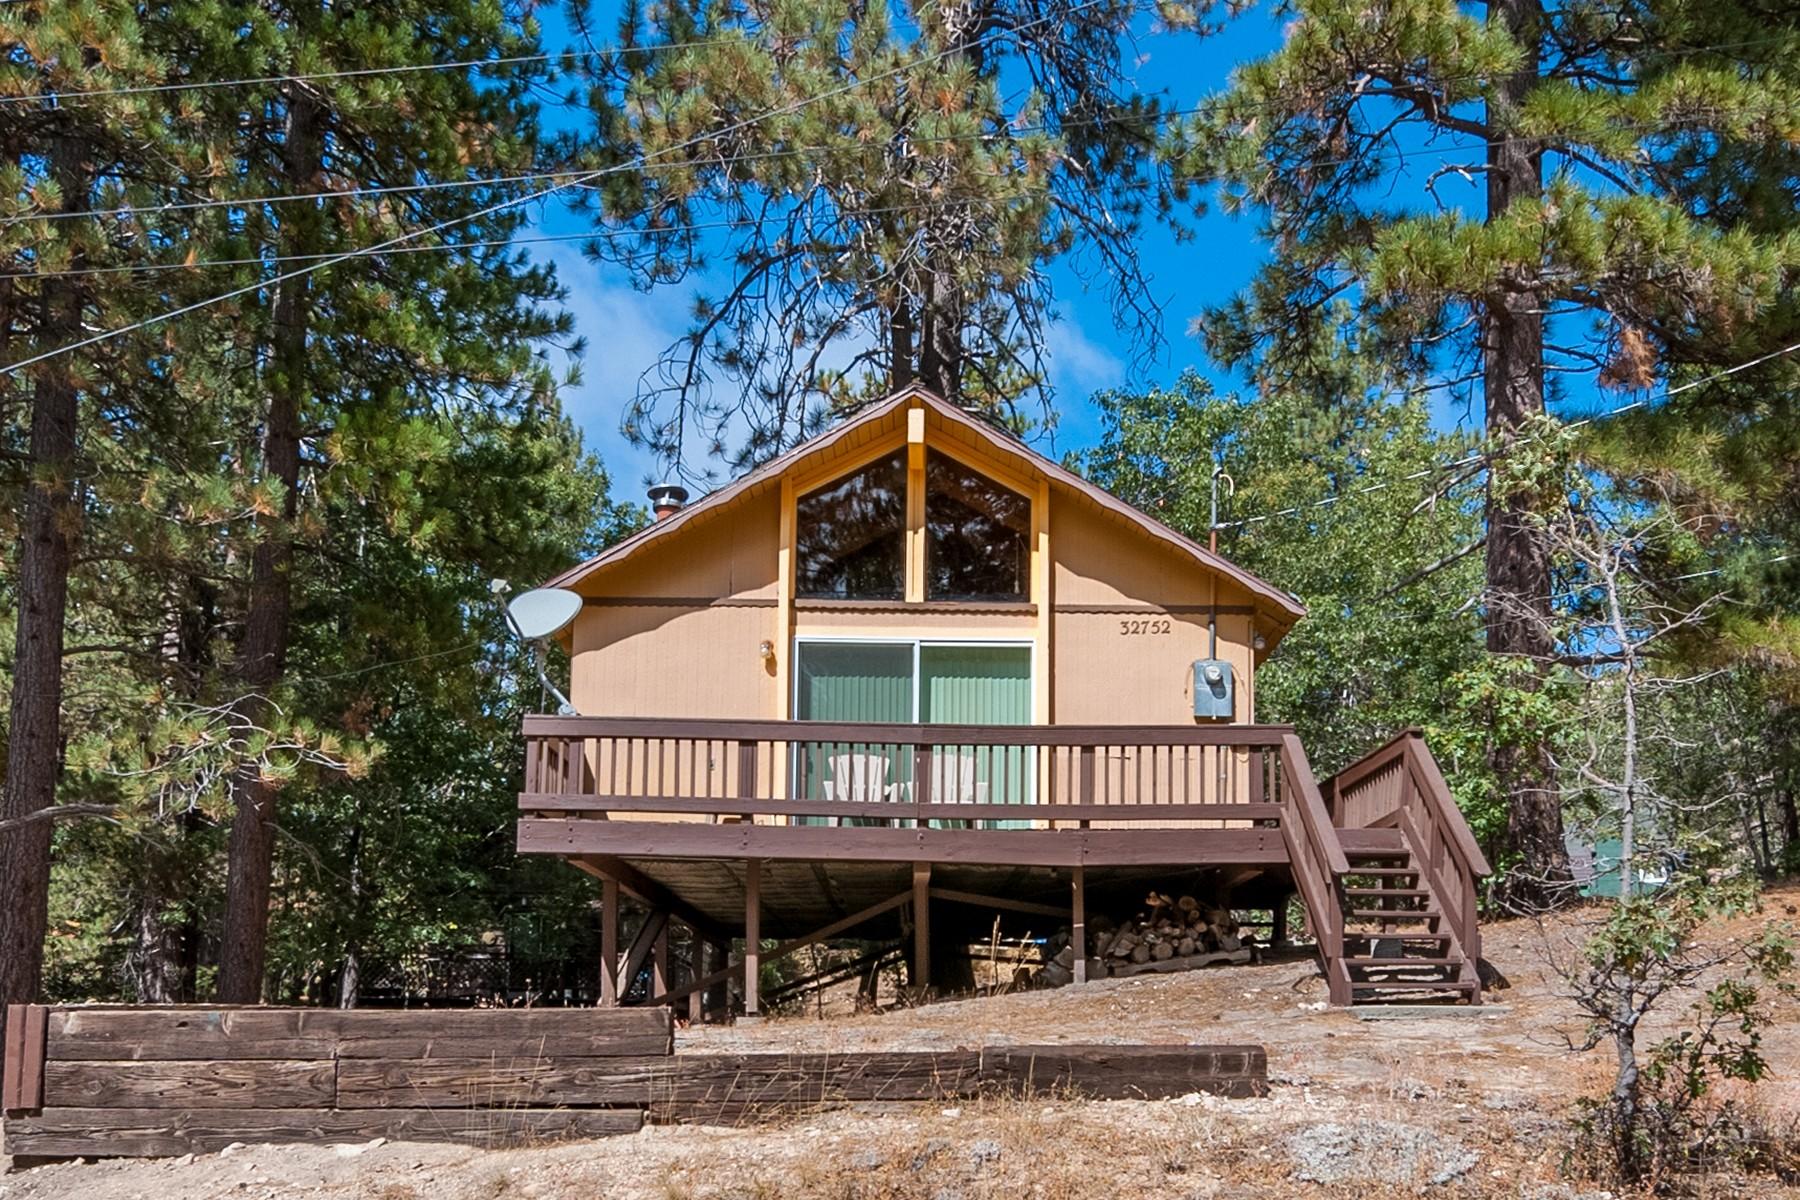 Single Family Homes for Sale at 32752 Tulip Lane Arrow Bear, CA 92382 32752 Tulip Lane Running Springs, California 92382 United States